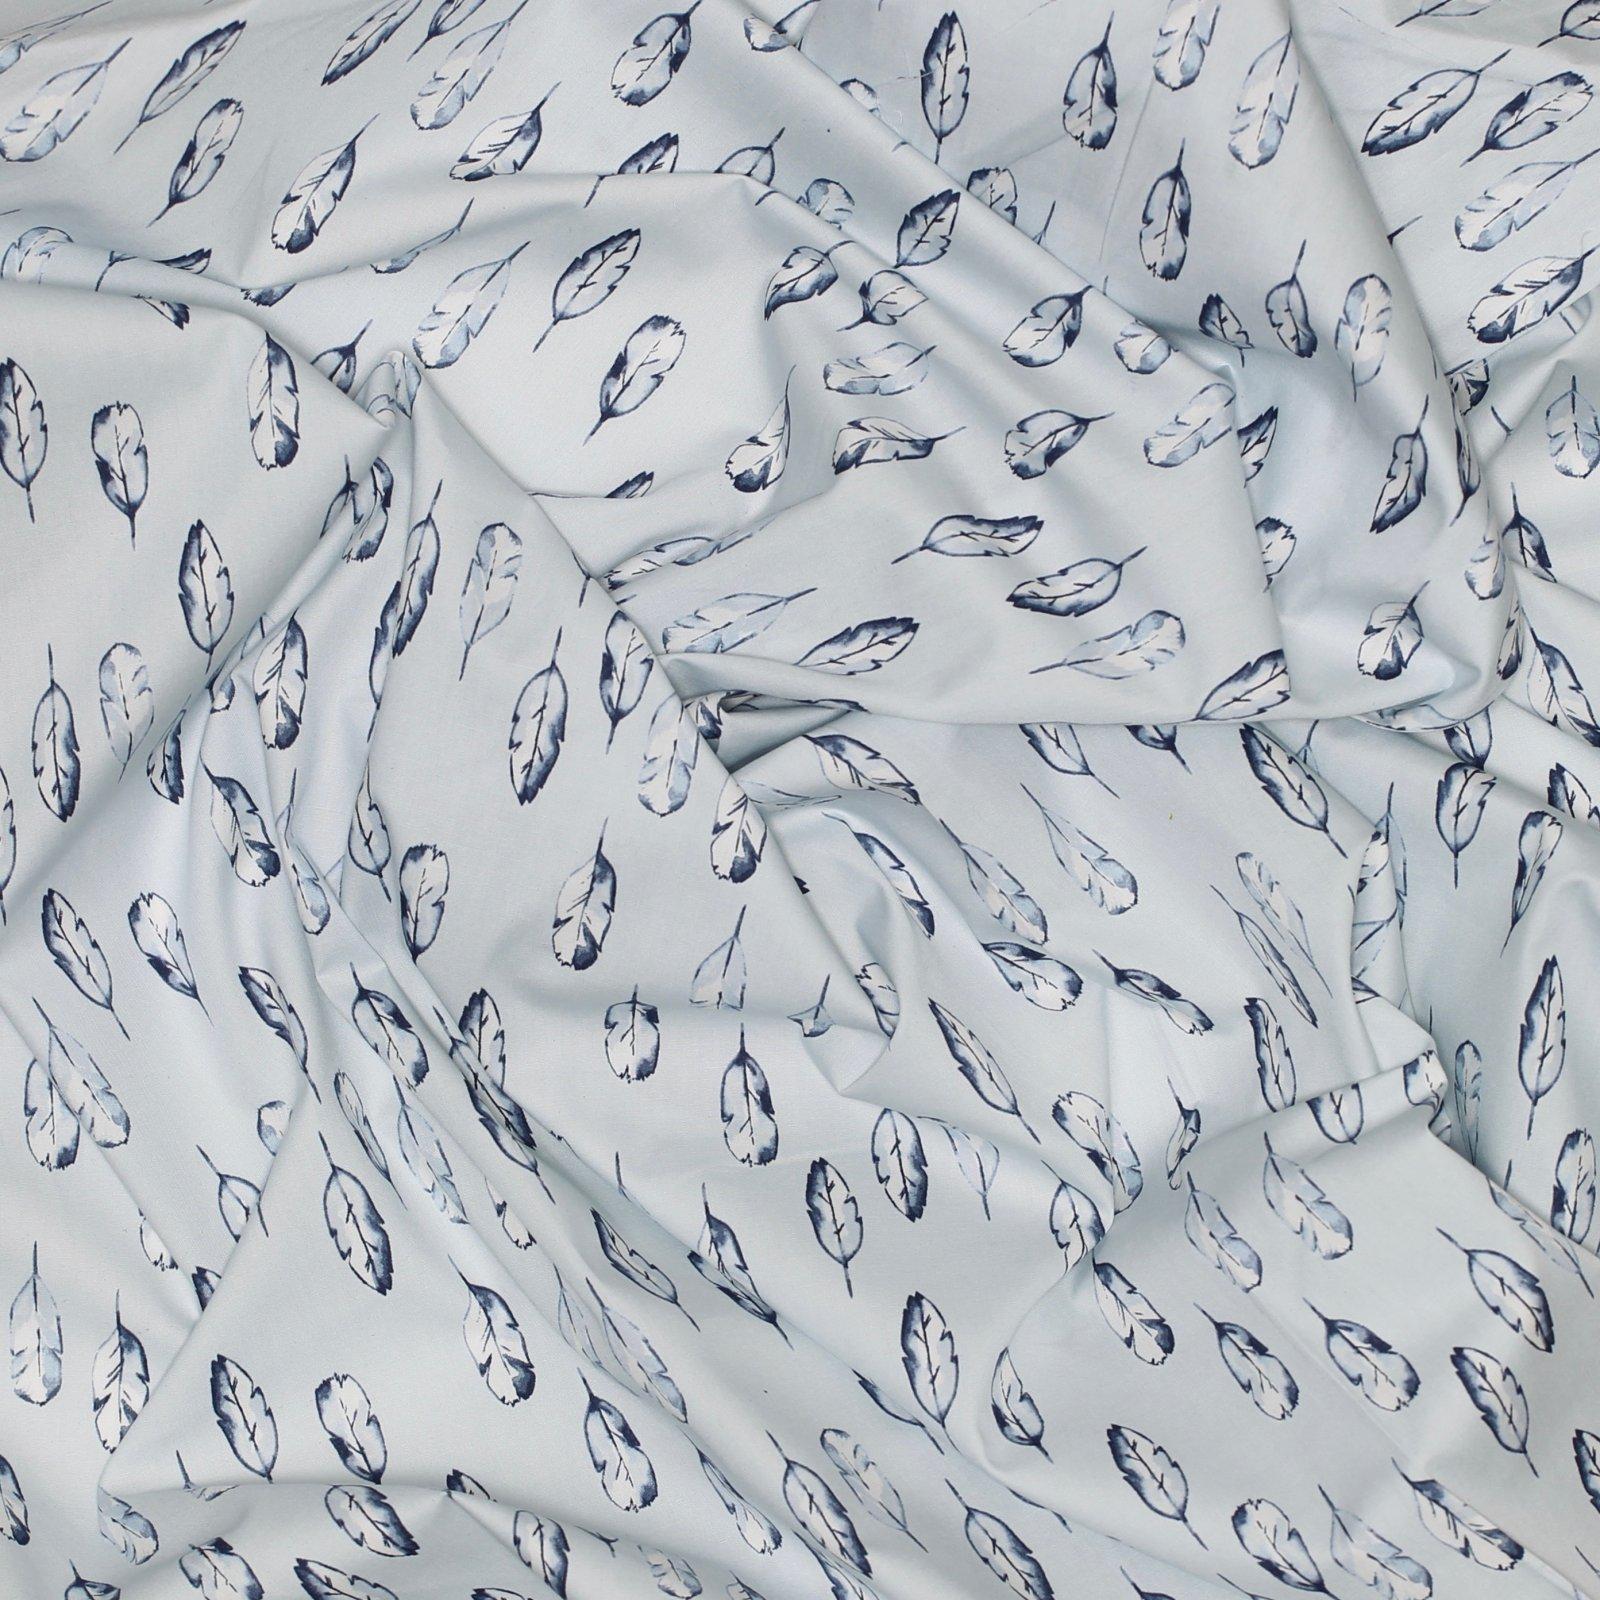 Monaluna Organic Fabric - Feather Cotton Poplin